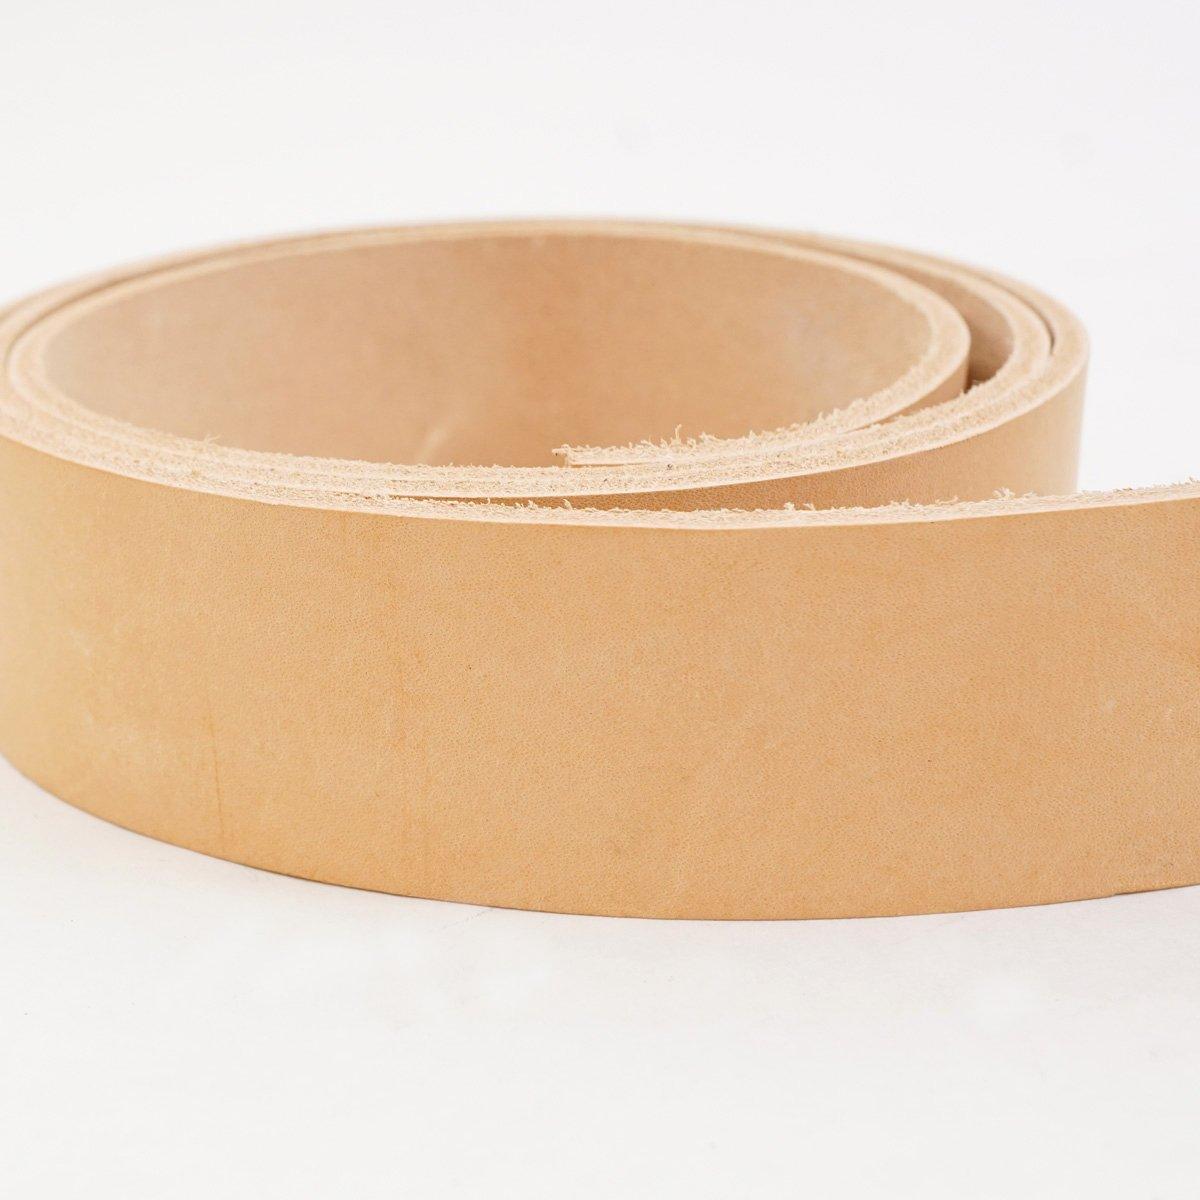 #2 Vegetable Tan Import Cowhide Leather Strip 8//9 oz 1-1//4x50